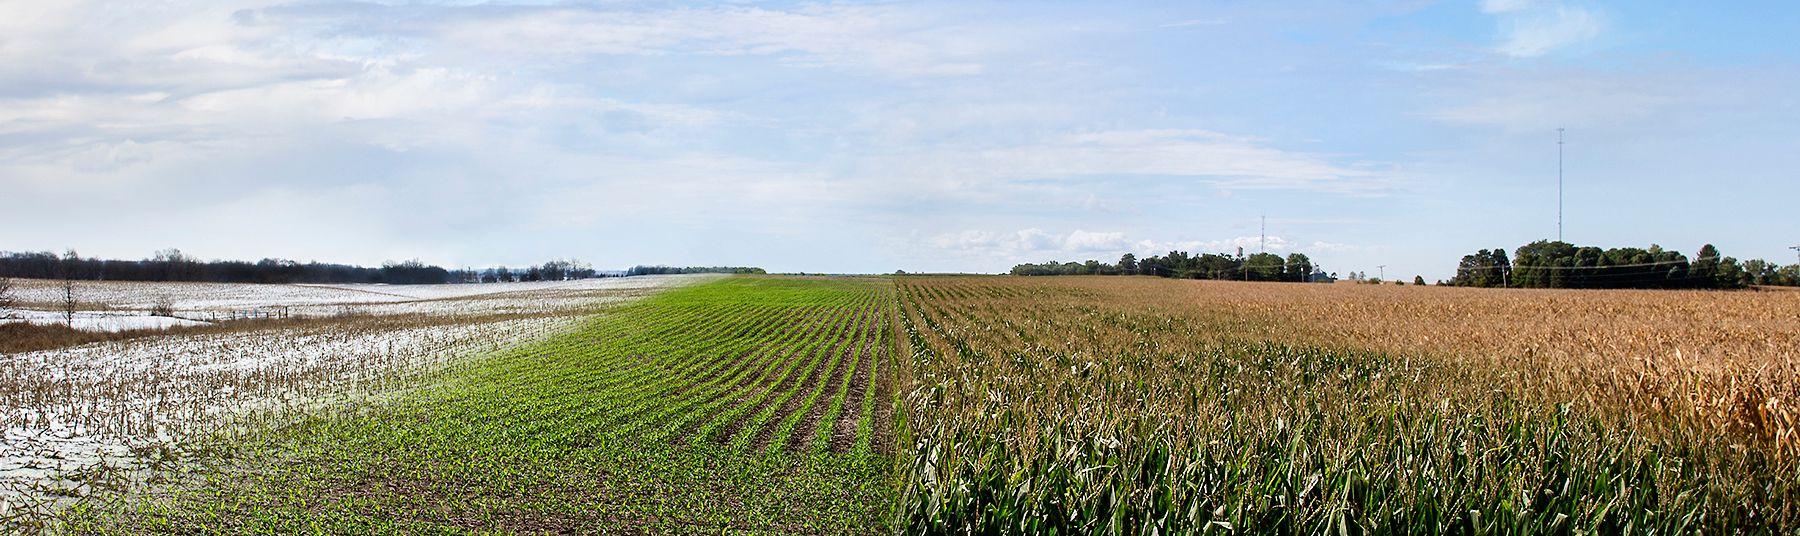 farm4livebooks.jpg